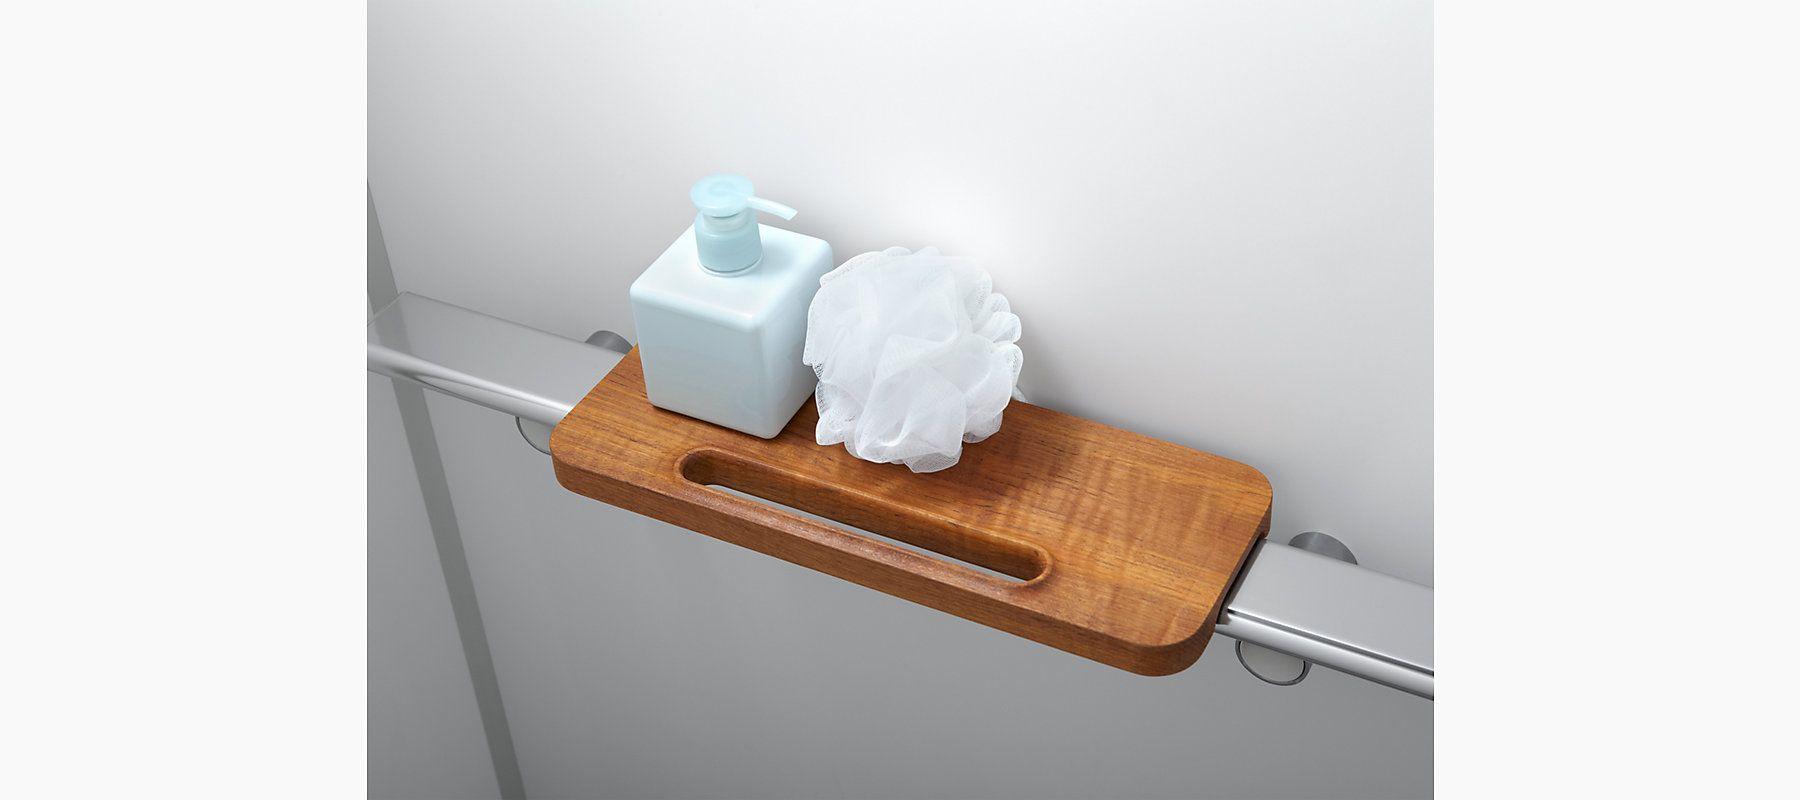 http://www.us.kohler.com/us/Choreograph™-shower-teak-tray/productDetail/Shower-Walls/1106640.htm